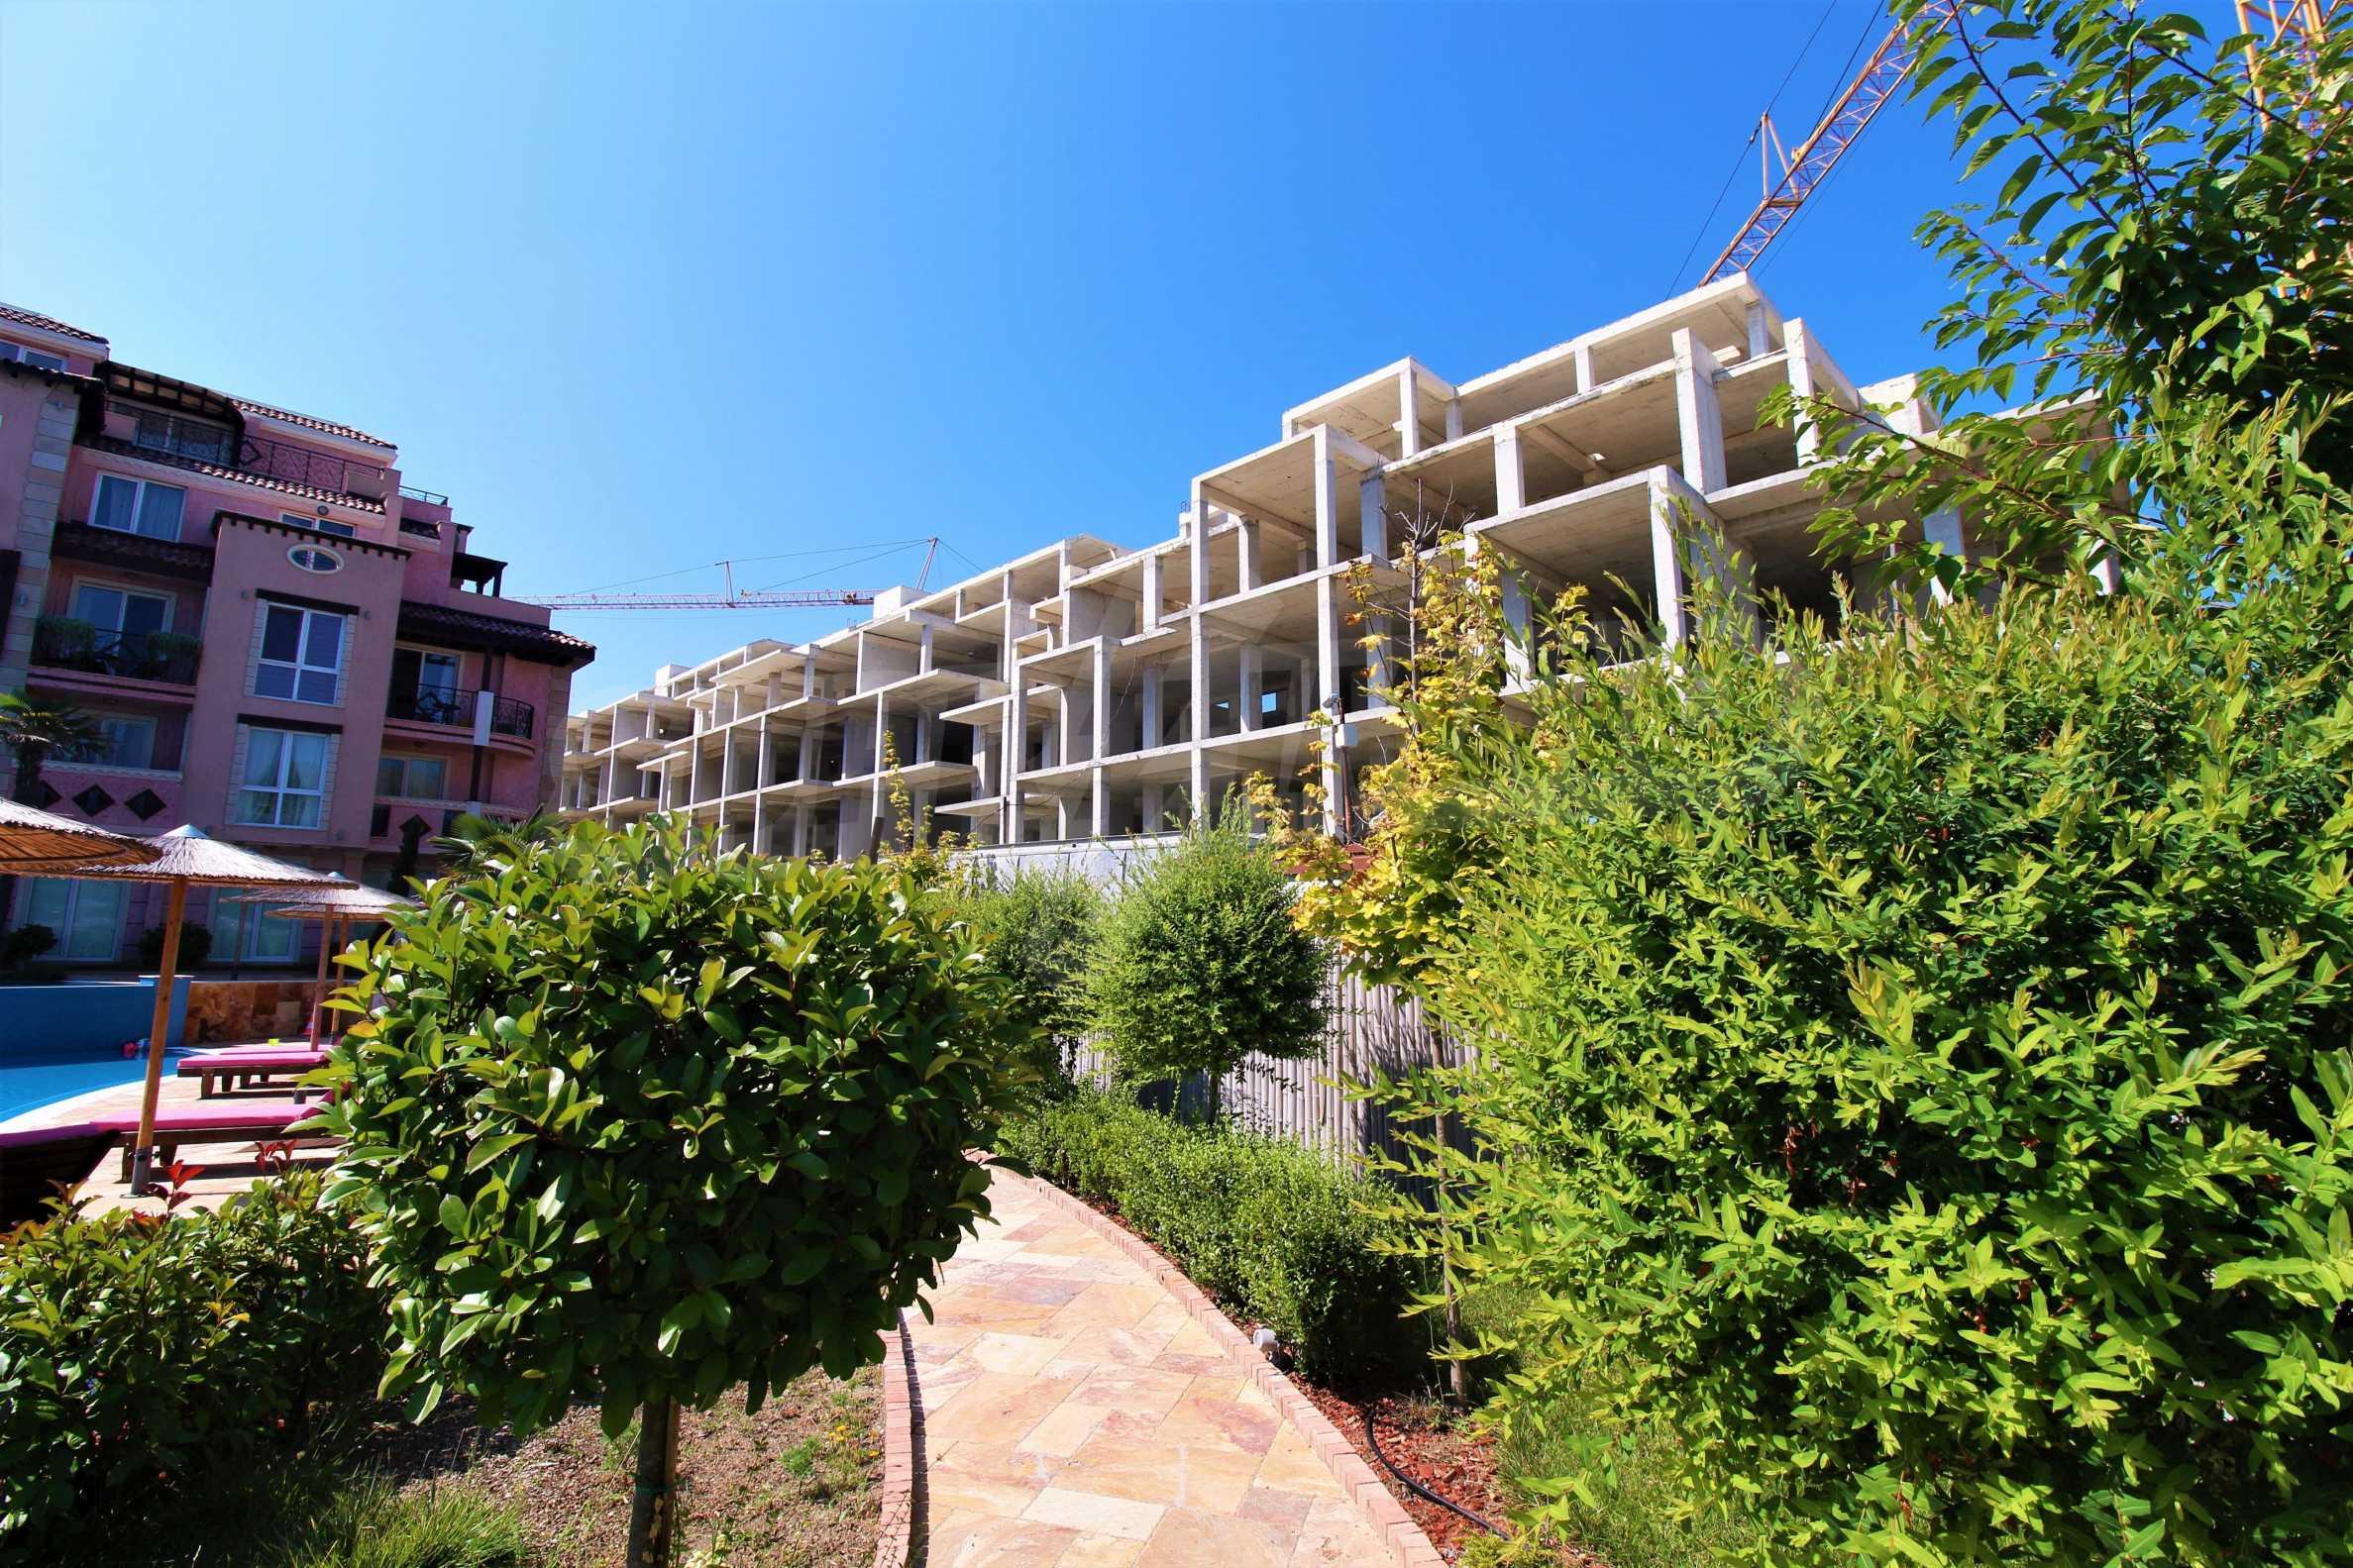 New 1-bedroom apartment in a coastal complex by the Kavatsite Beach (Sozopol) 14